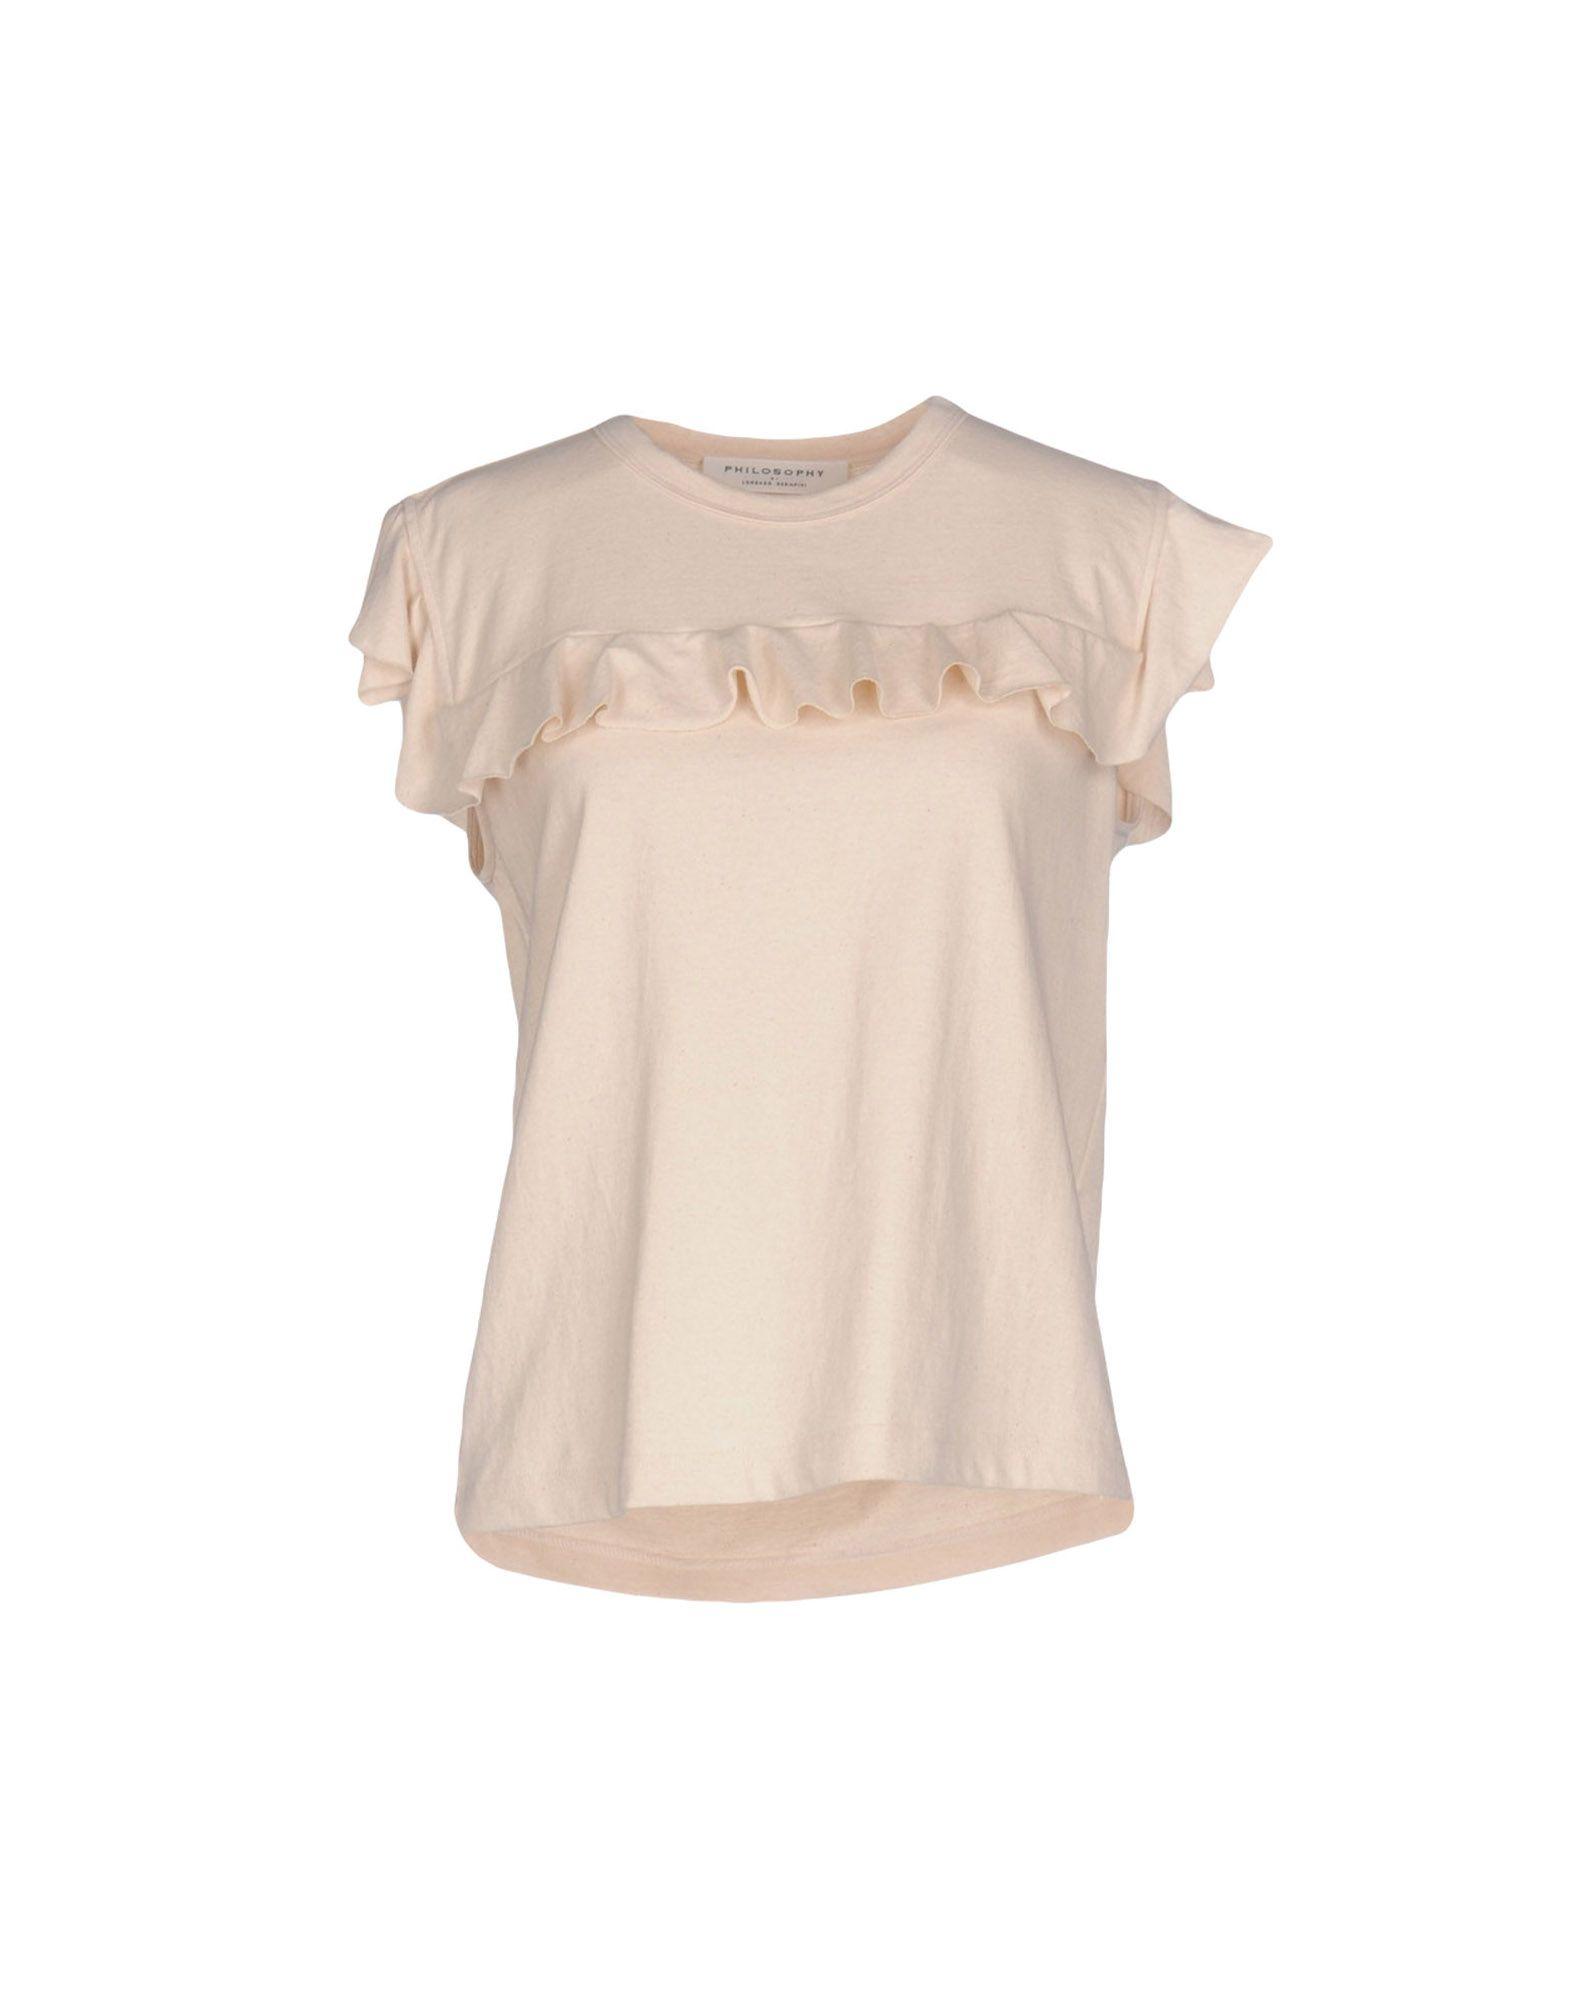 PHILOSOPHY di LORENZO SERAFINI T-shirts. Jersey Ruffles Logo Solid color Round collar Short sleeves No pockets. 100% Cotton